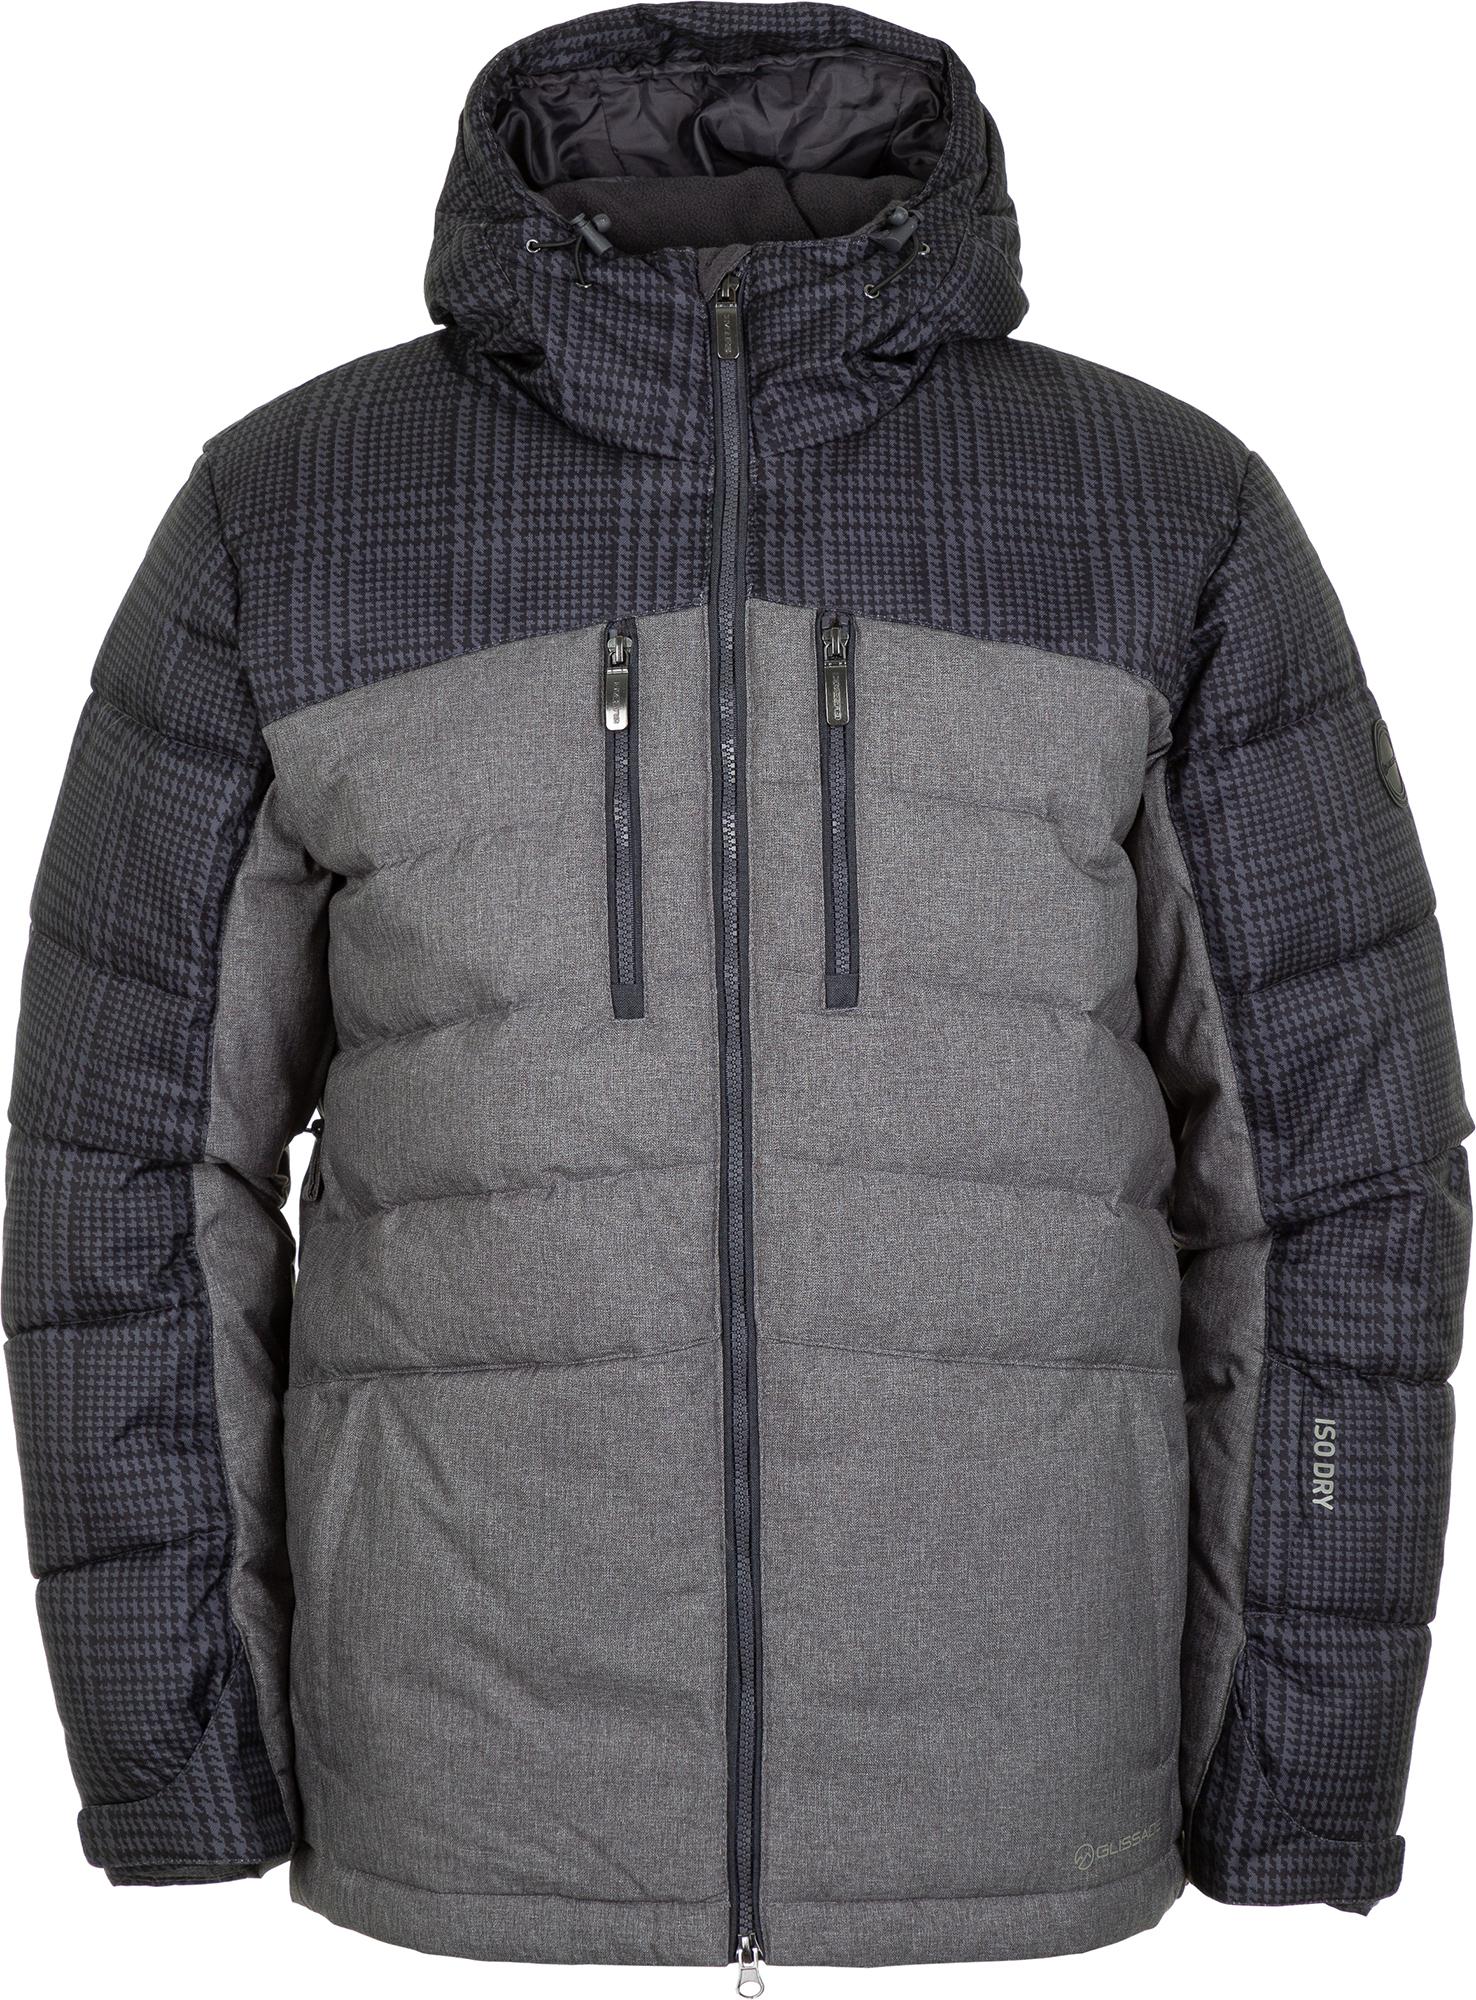 Glissade Куртка пуховая мужская Glissade, размер 60-62 куртка мужская reebok f puff bomber цвет черный dh2140 размер xxl 60 62